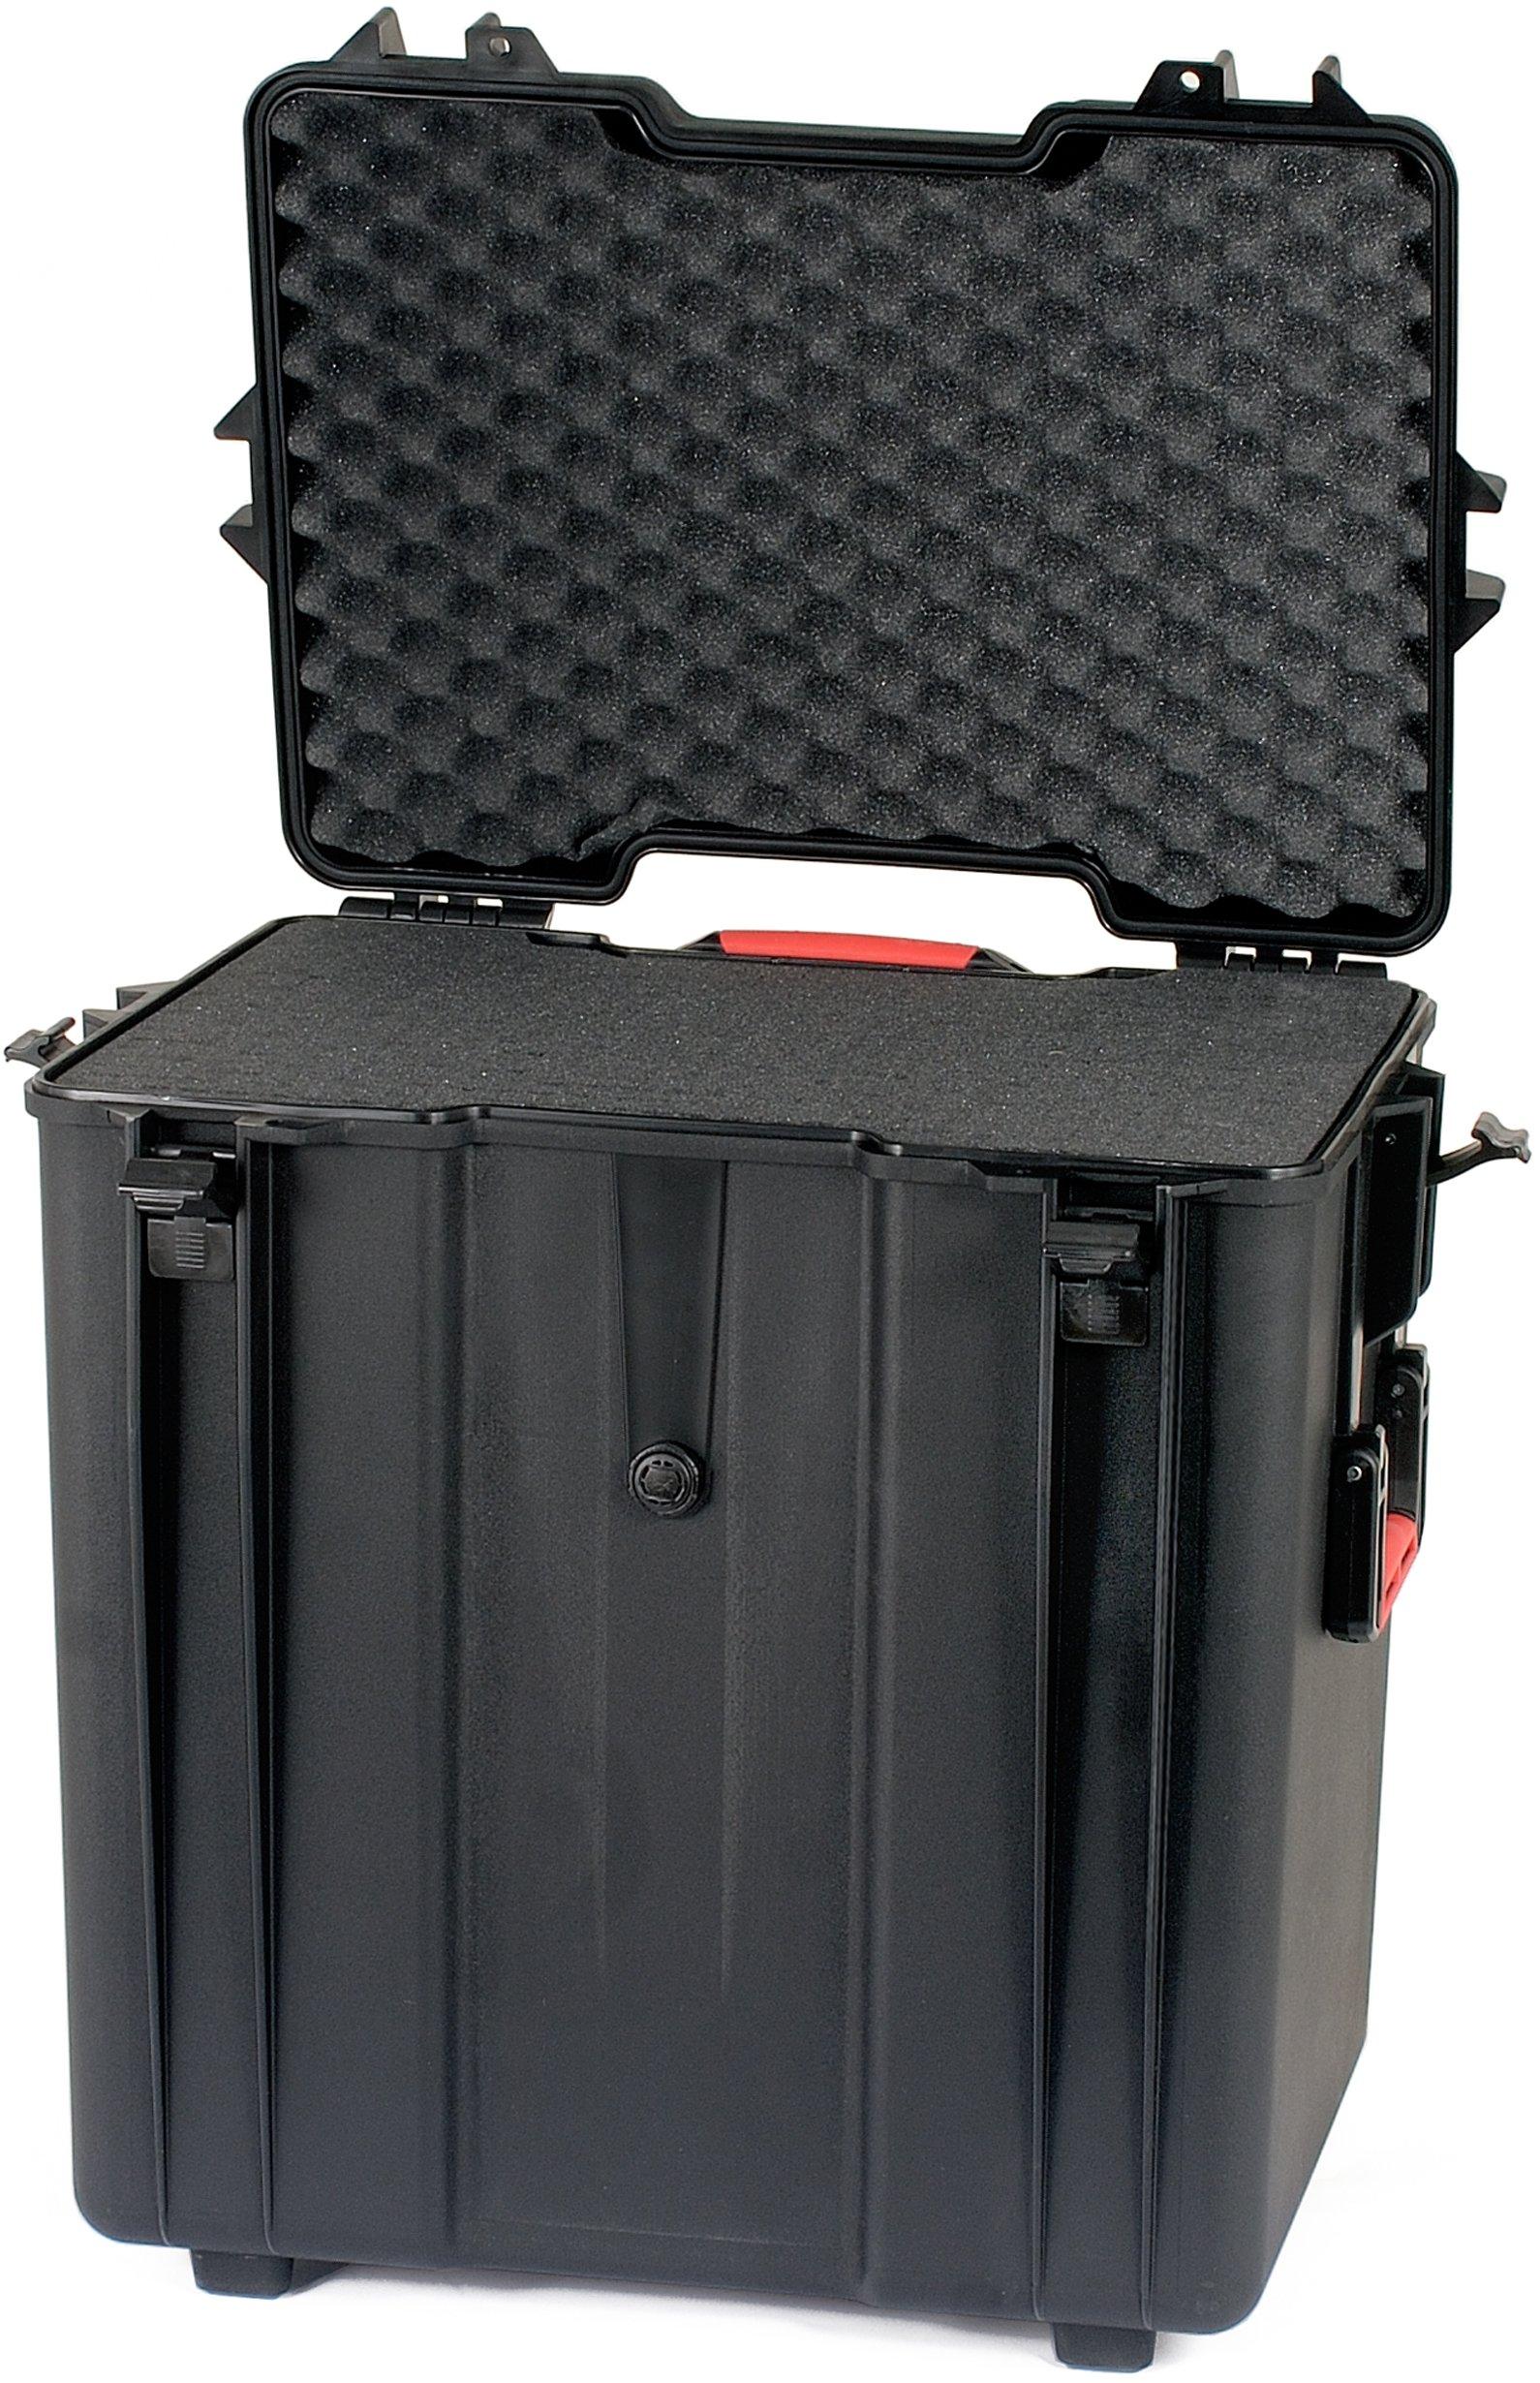 HPRC 4700W Case